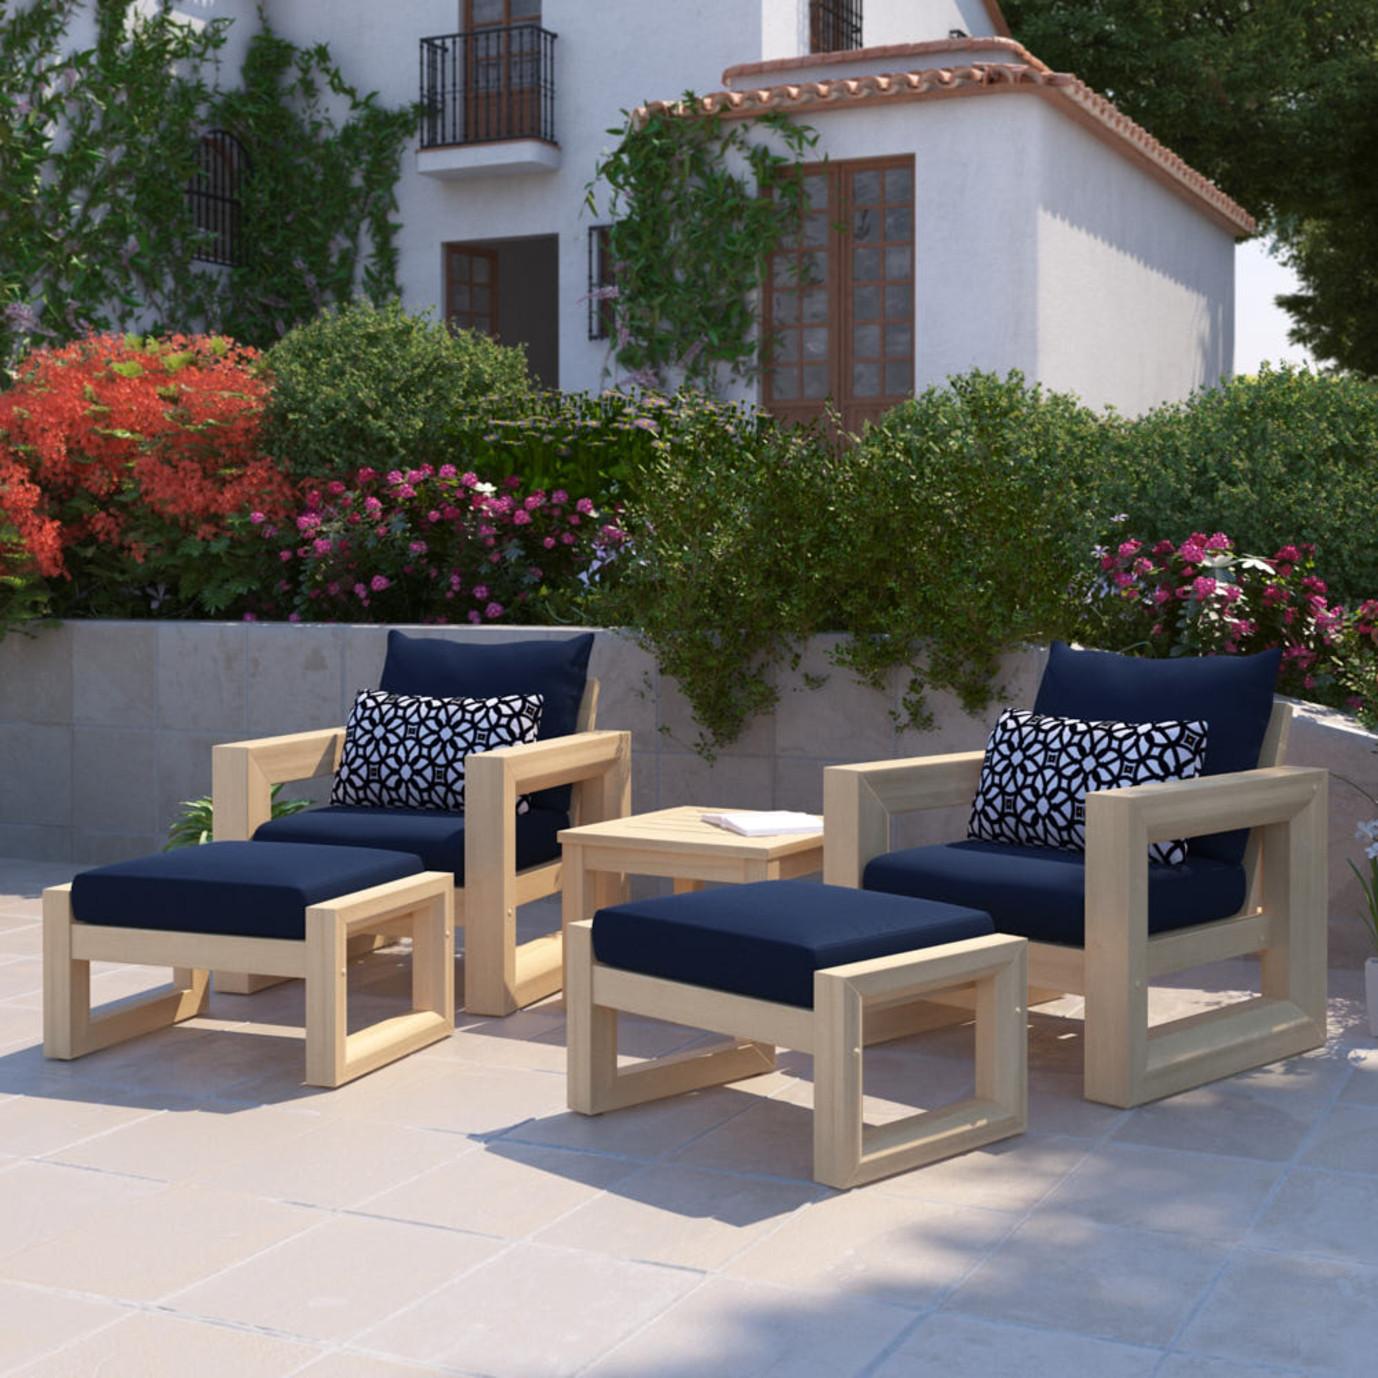 Benson 5 Piece Club Chair & Ottoman Set - Navy Blue